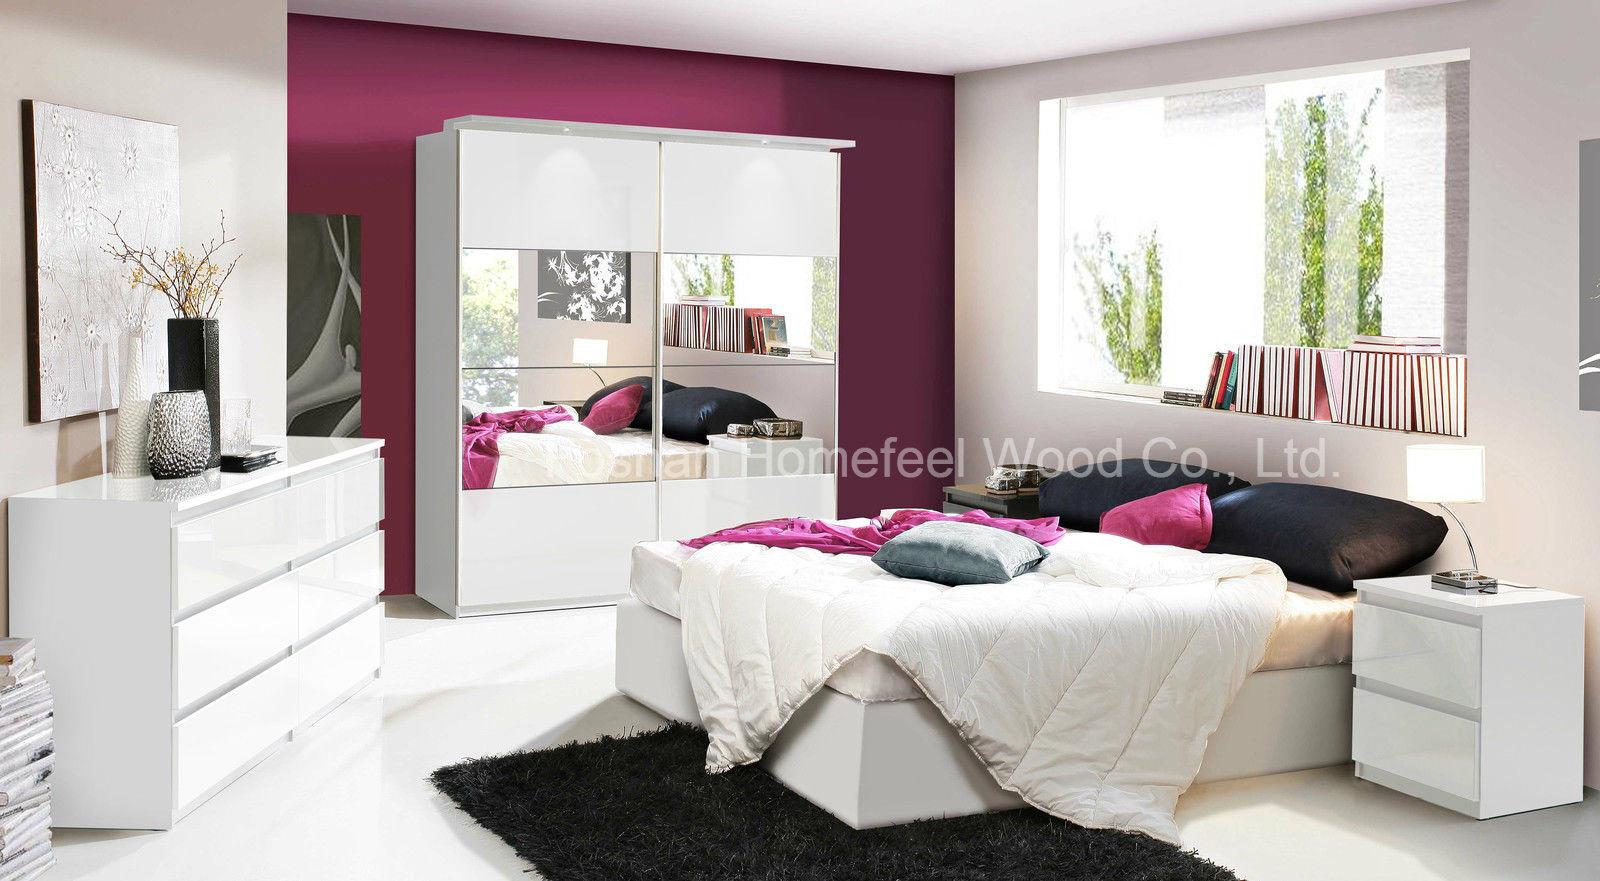 China Modern Bedroom Furniture in White High Gloss (HF-EY6